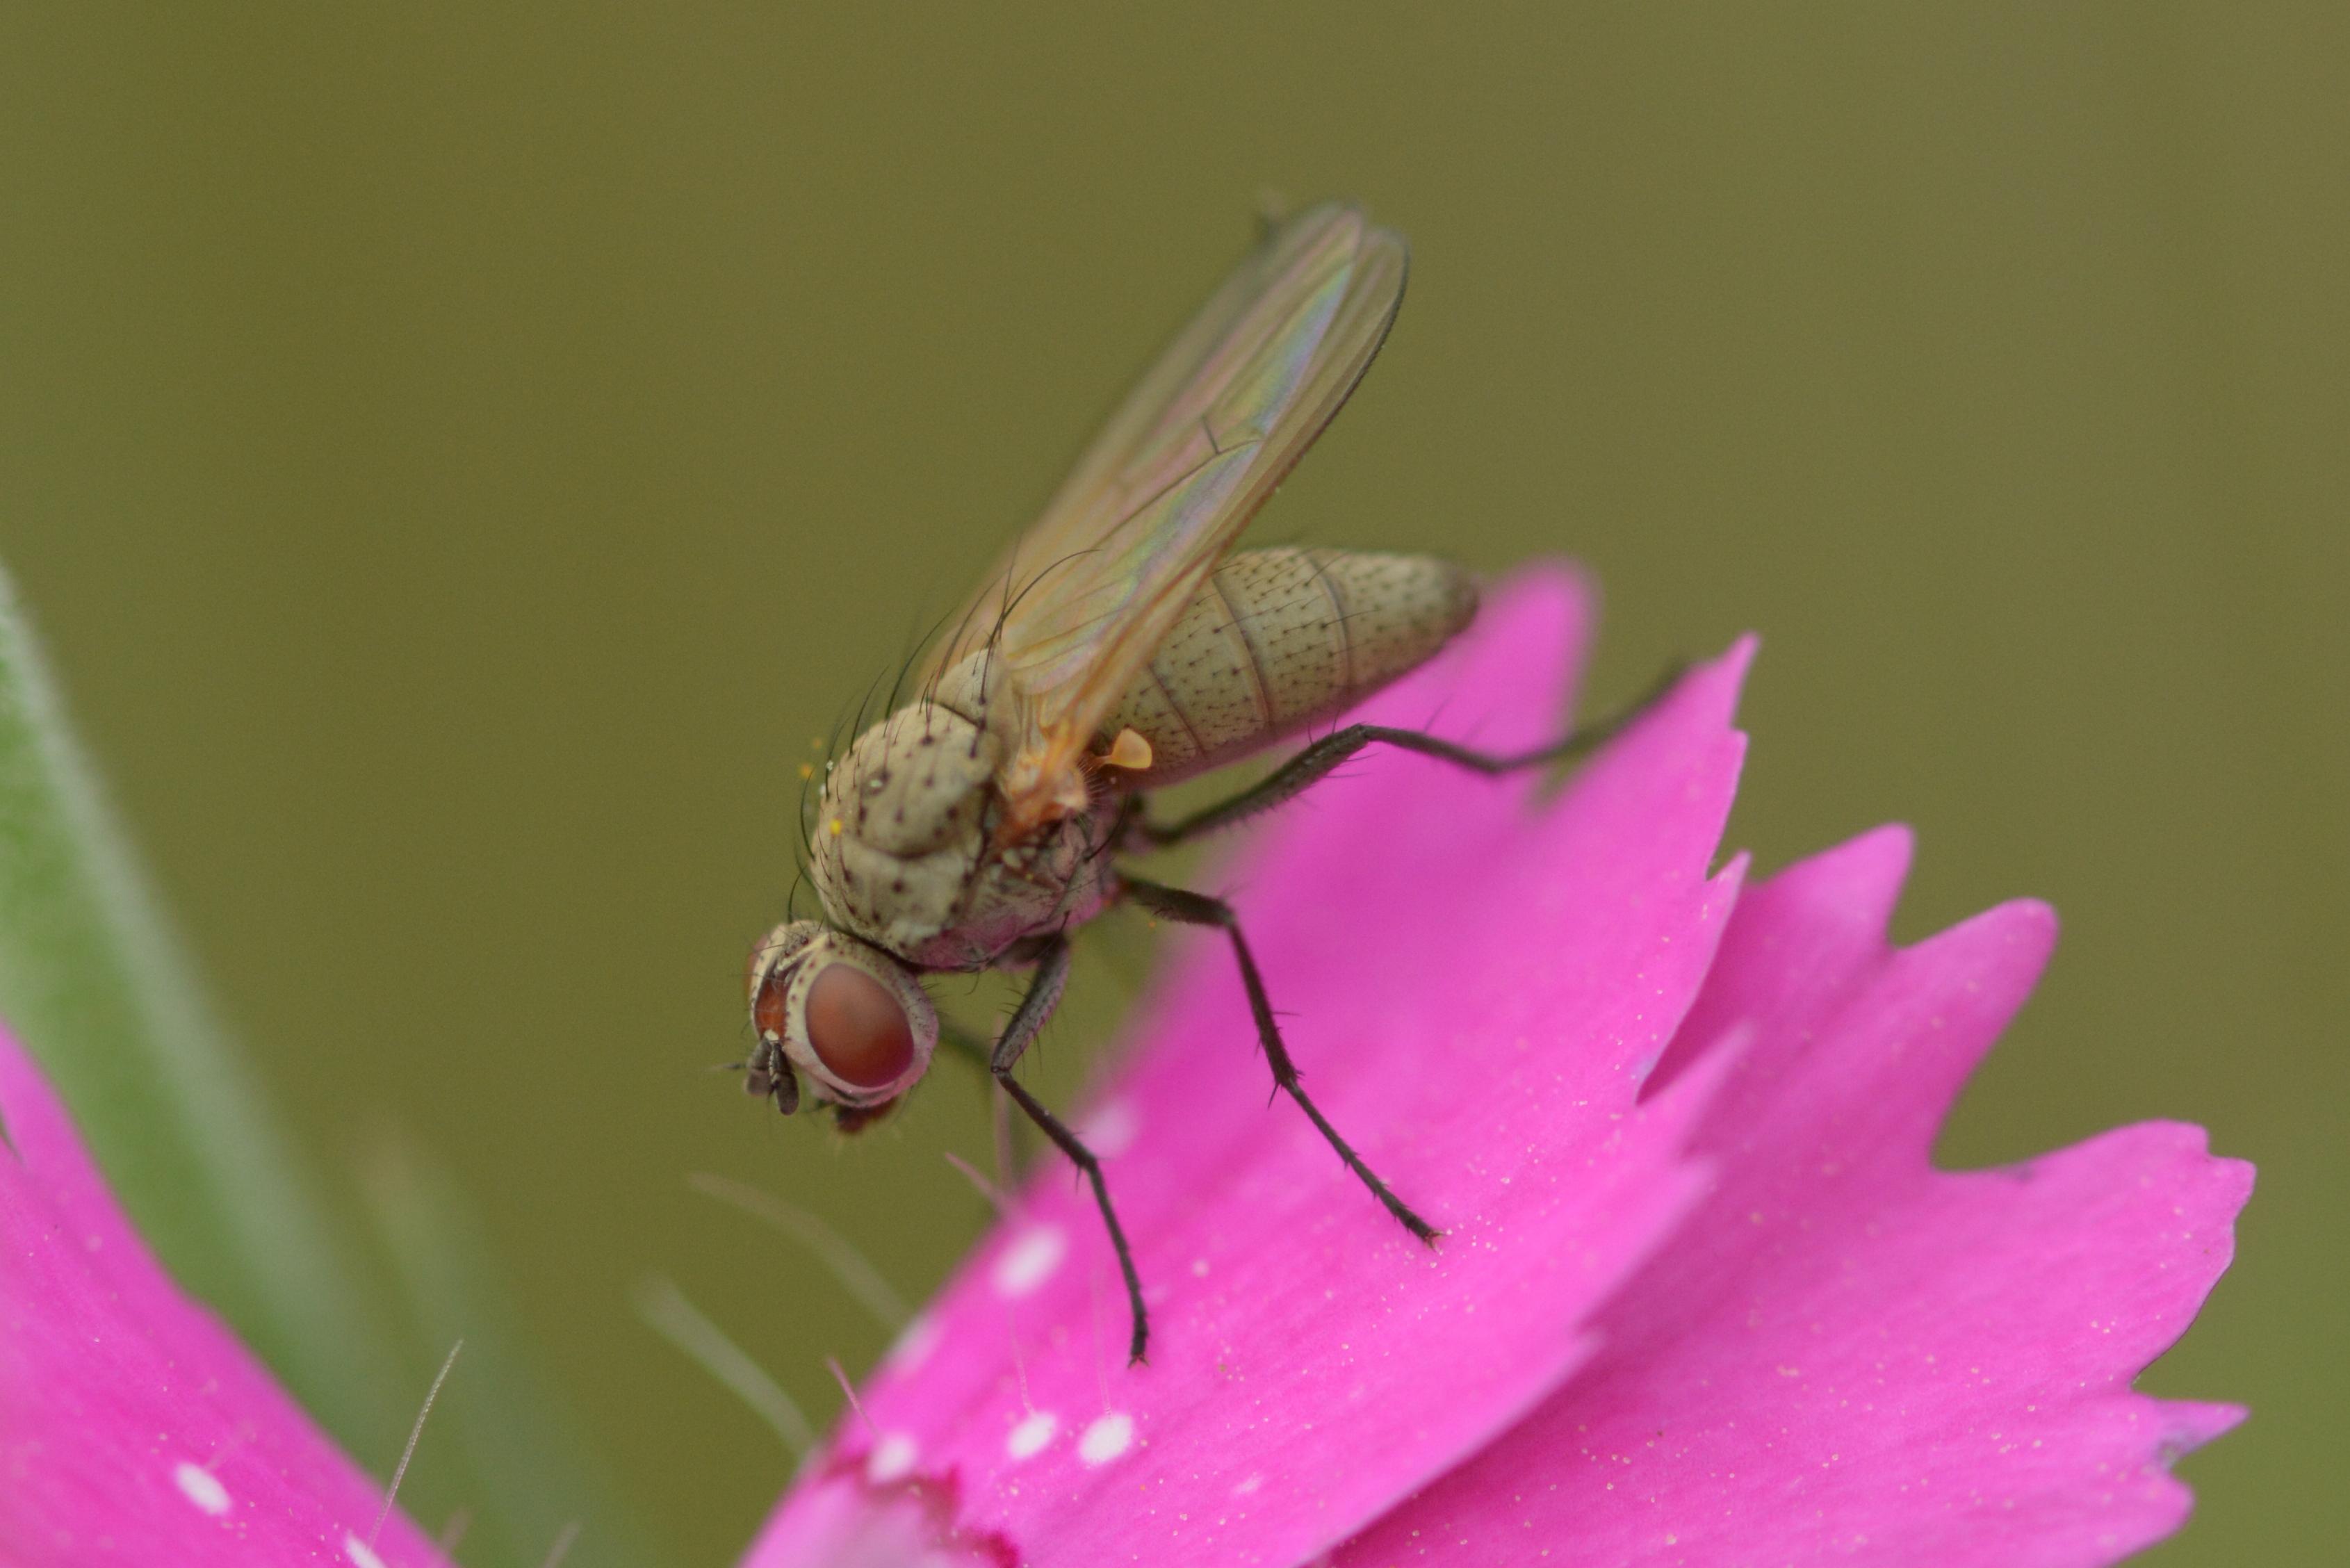 www.naturalis-historia.de/bilder/temp/DSC_5818.JPG